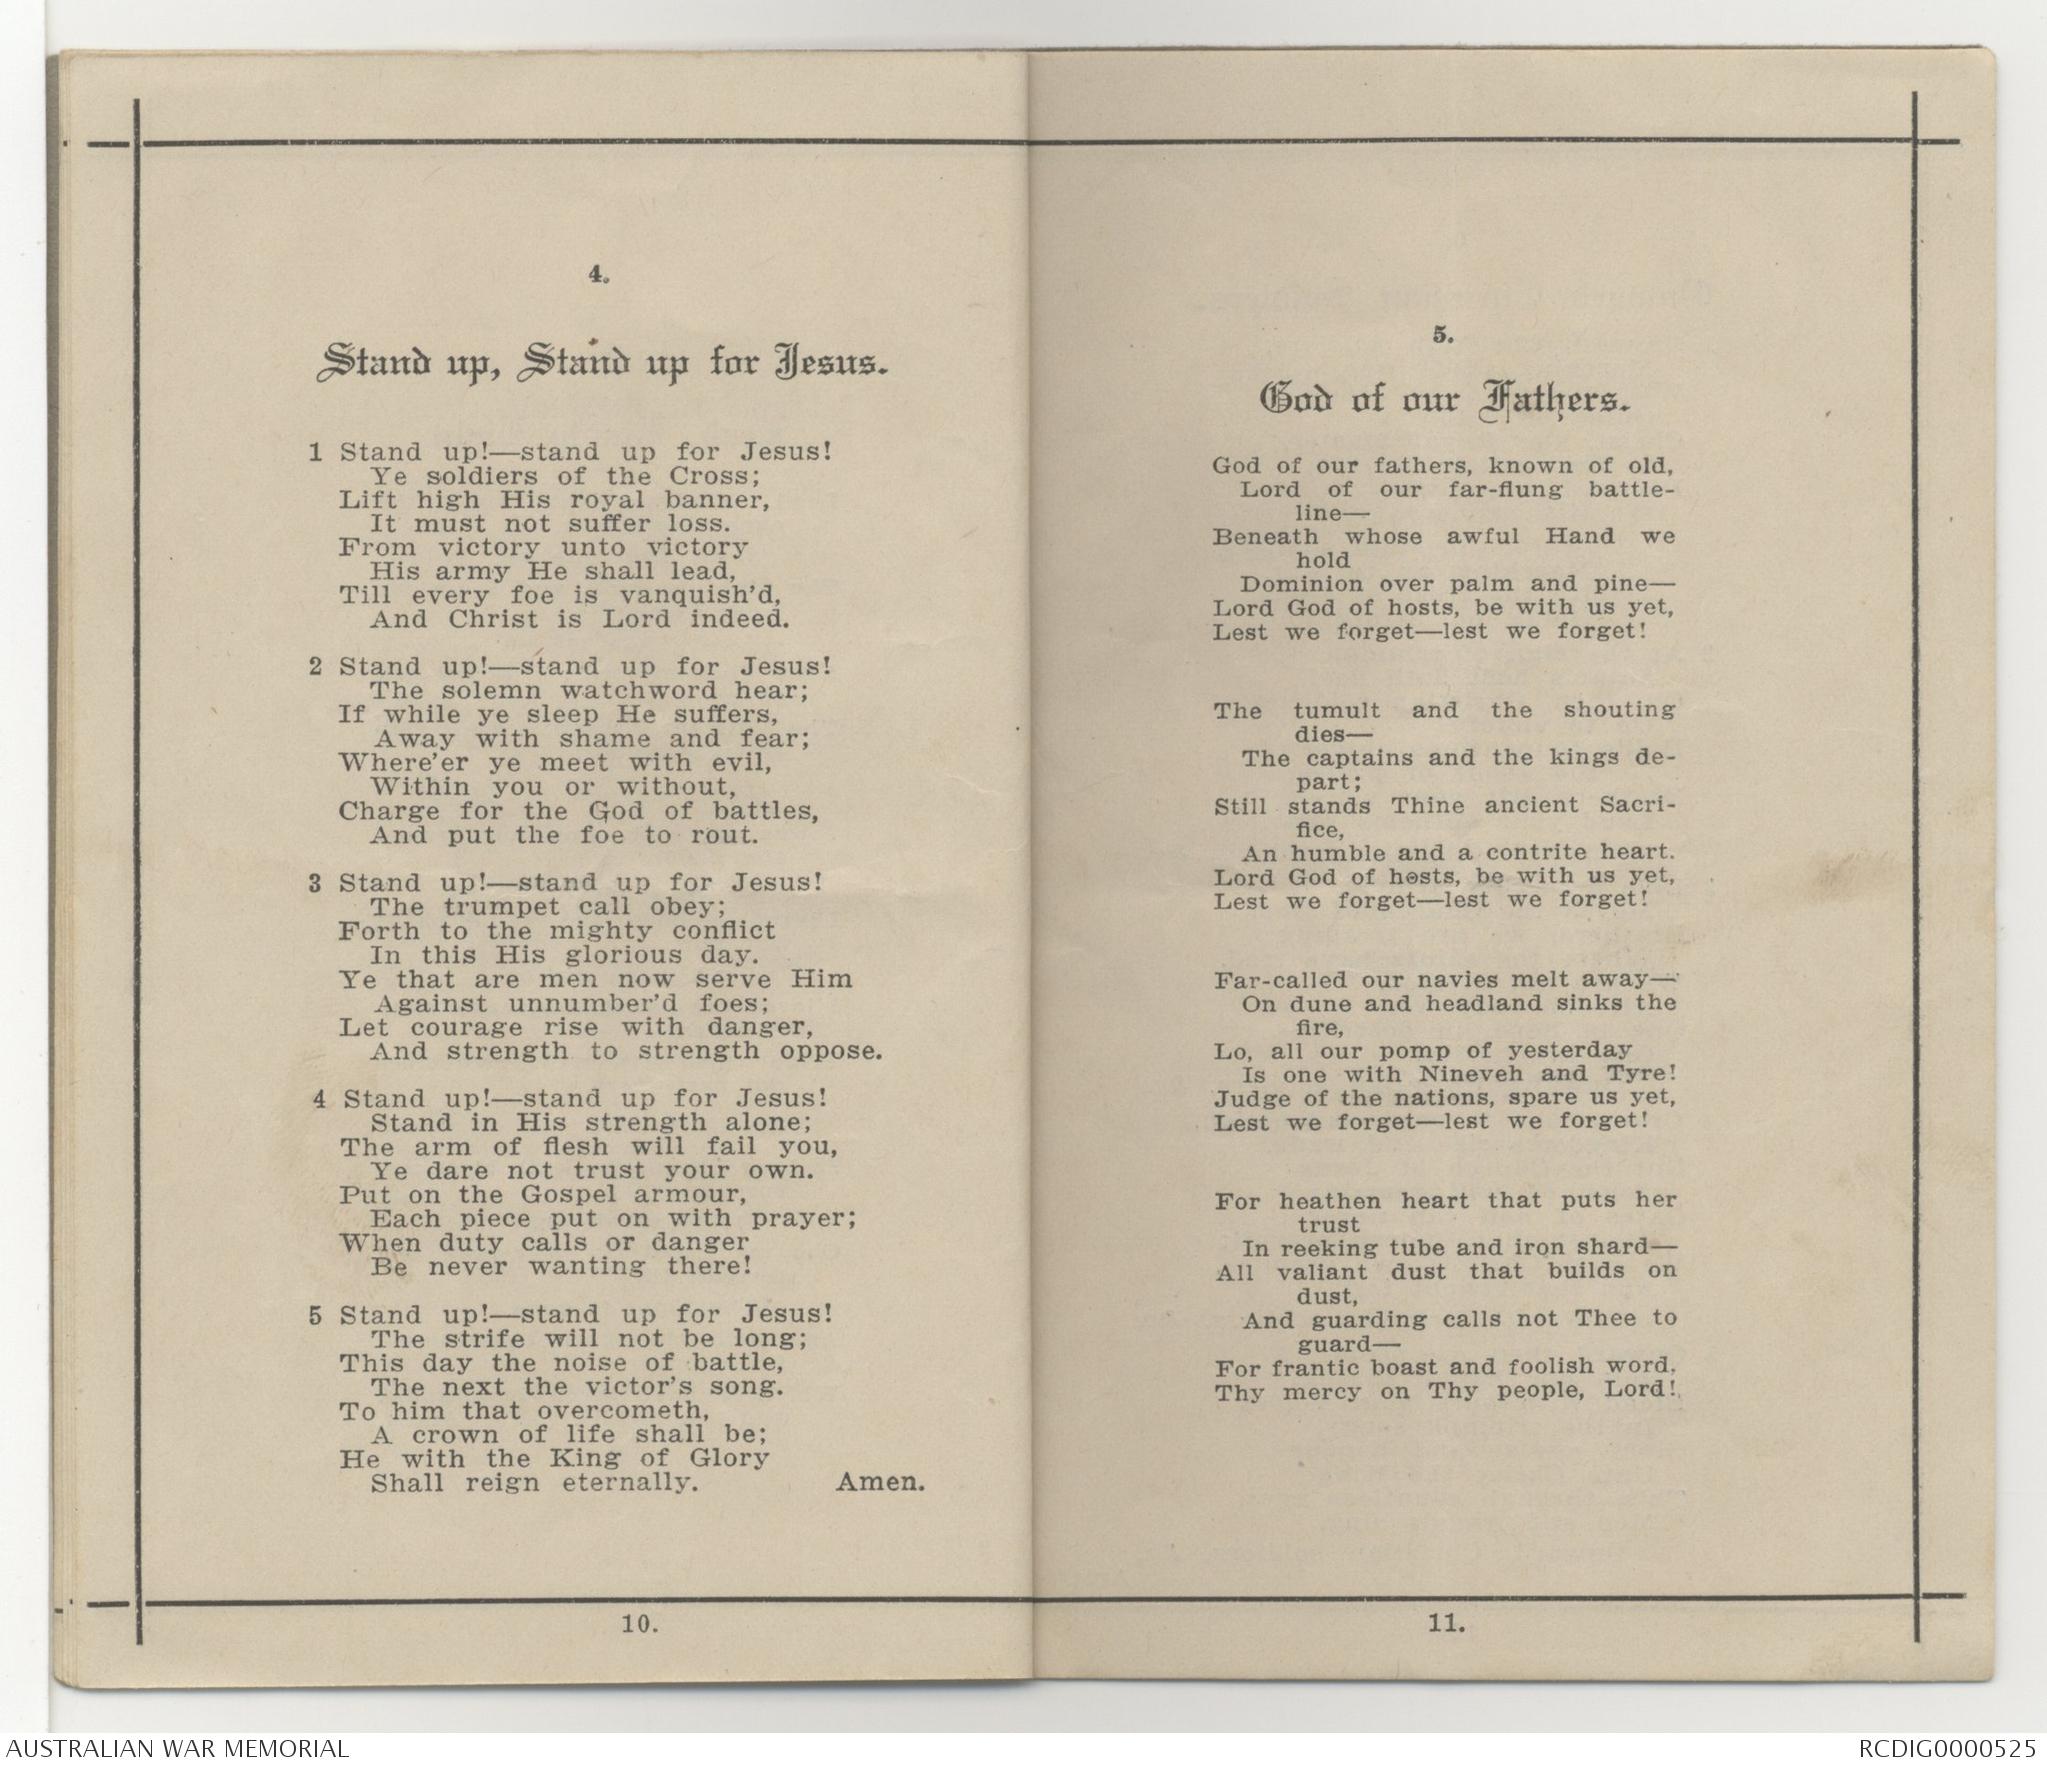 Publications and General Souvenirs | The Australian War Memorial